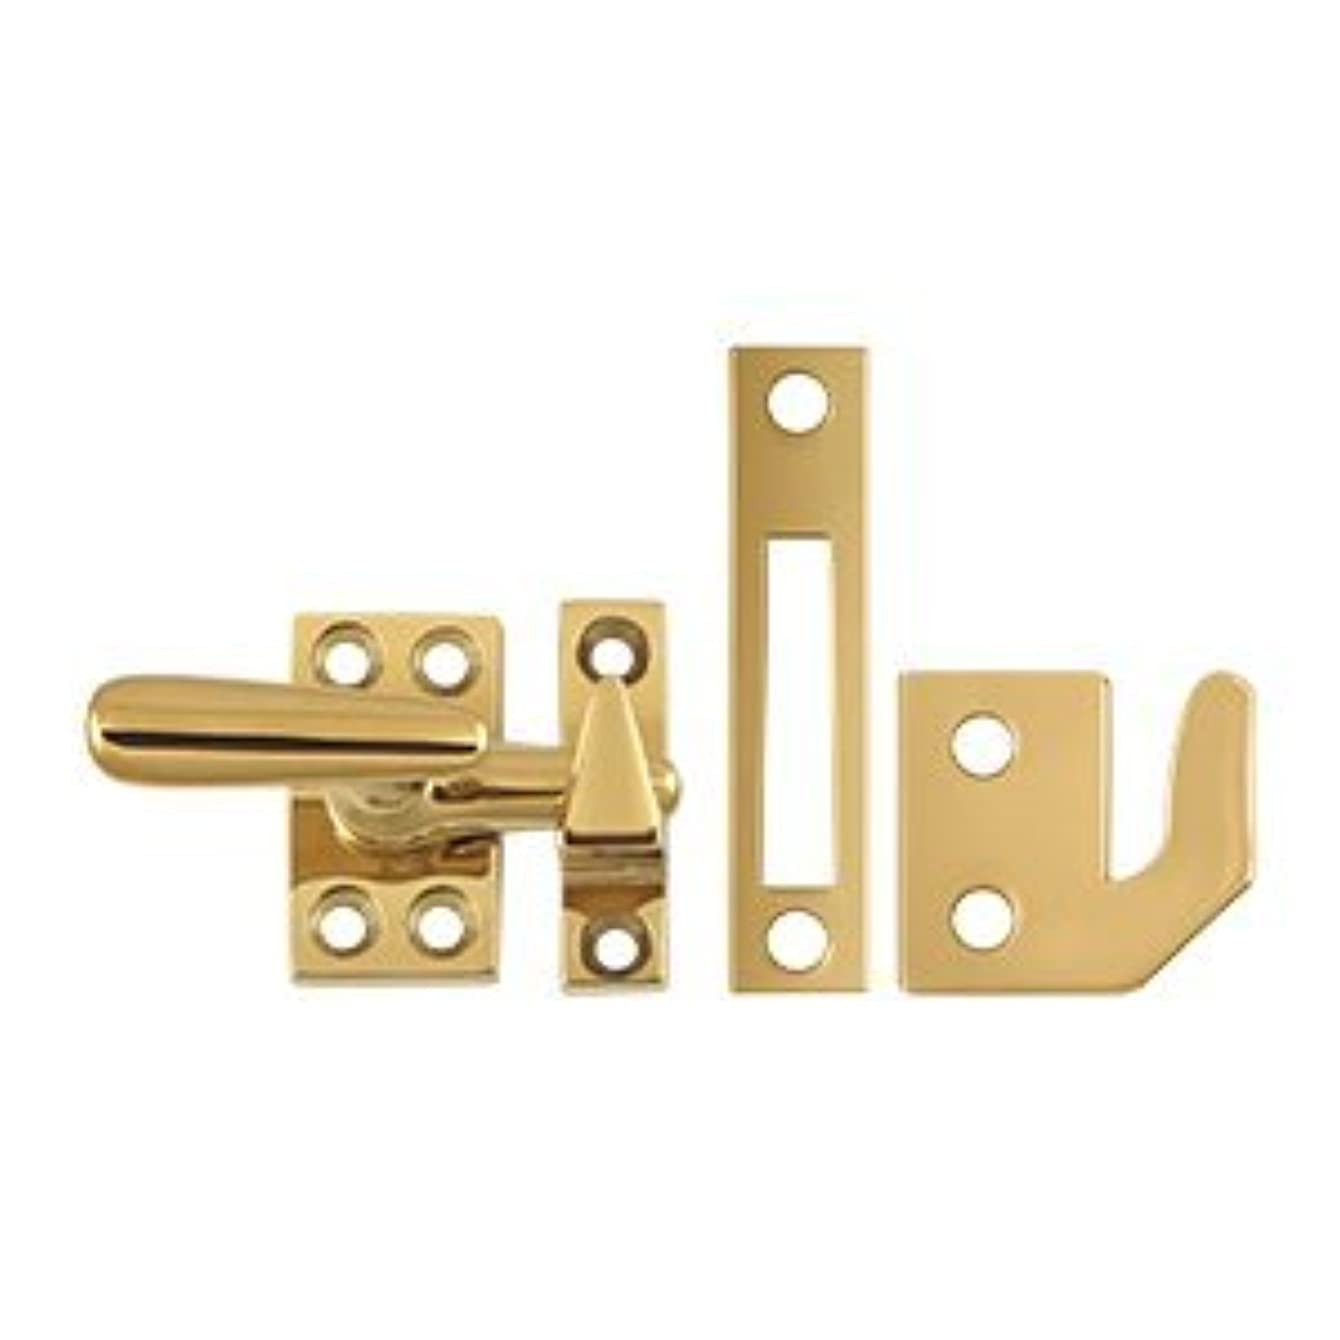 Deltana CF066 Small 4 Piece Solid Brass Window Casement Fastener, Lifetime Polished Brass